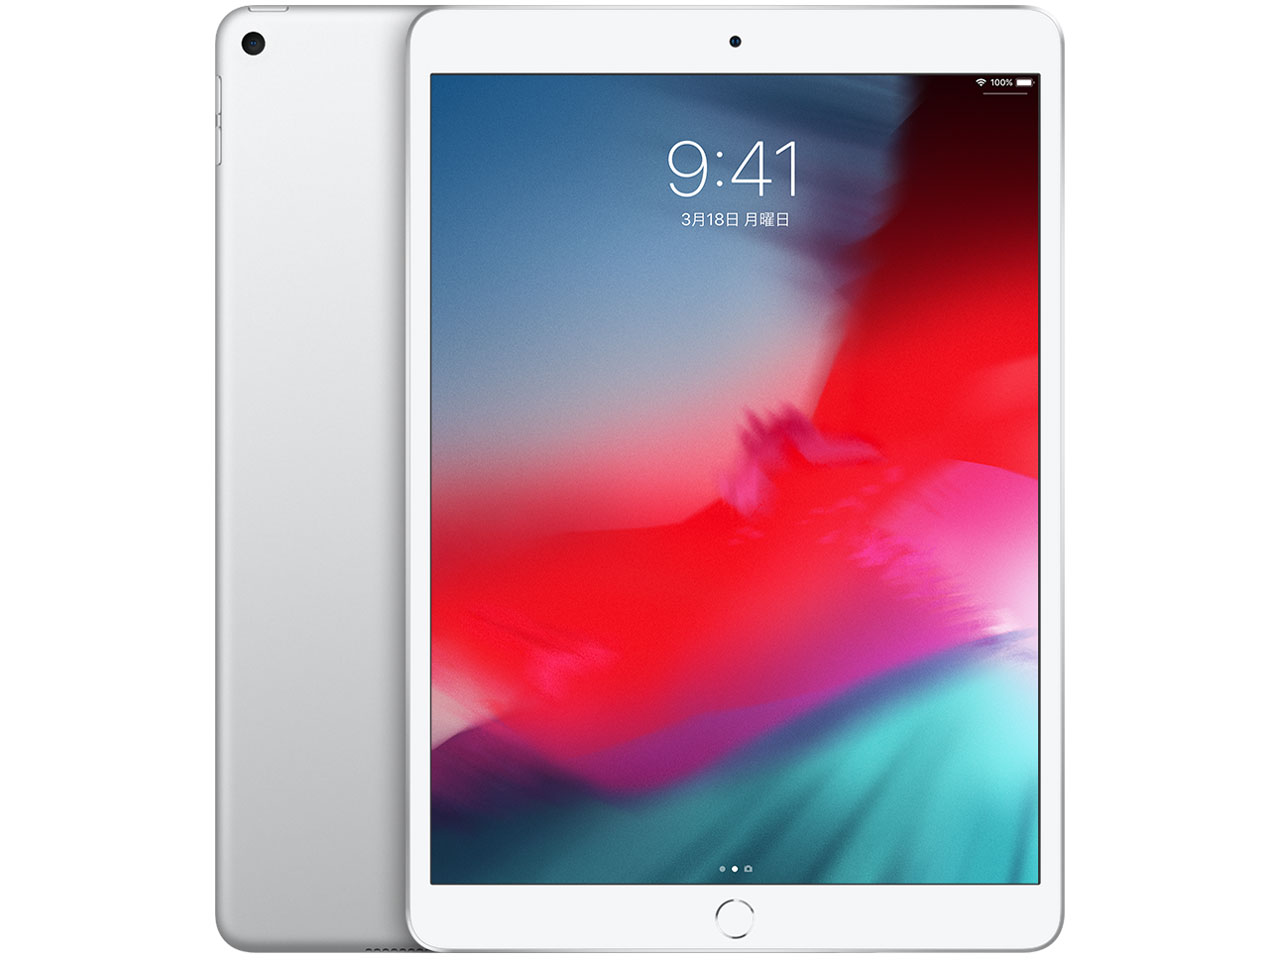 iPad Air 10.5インチ 第3世代 Wi-Fi 64GB 2019年春モデル の製品画像